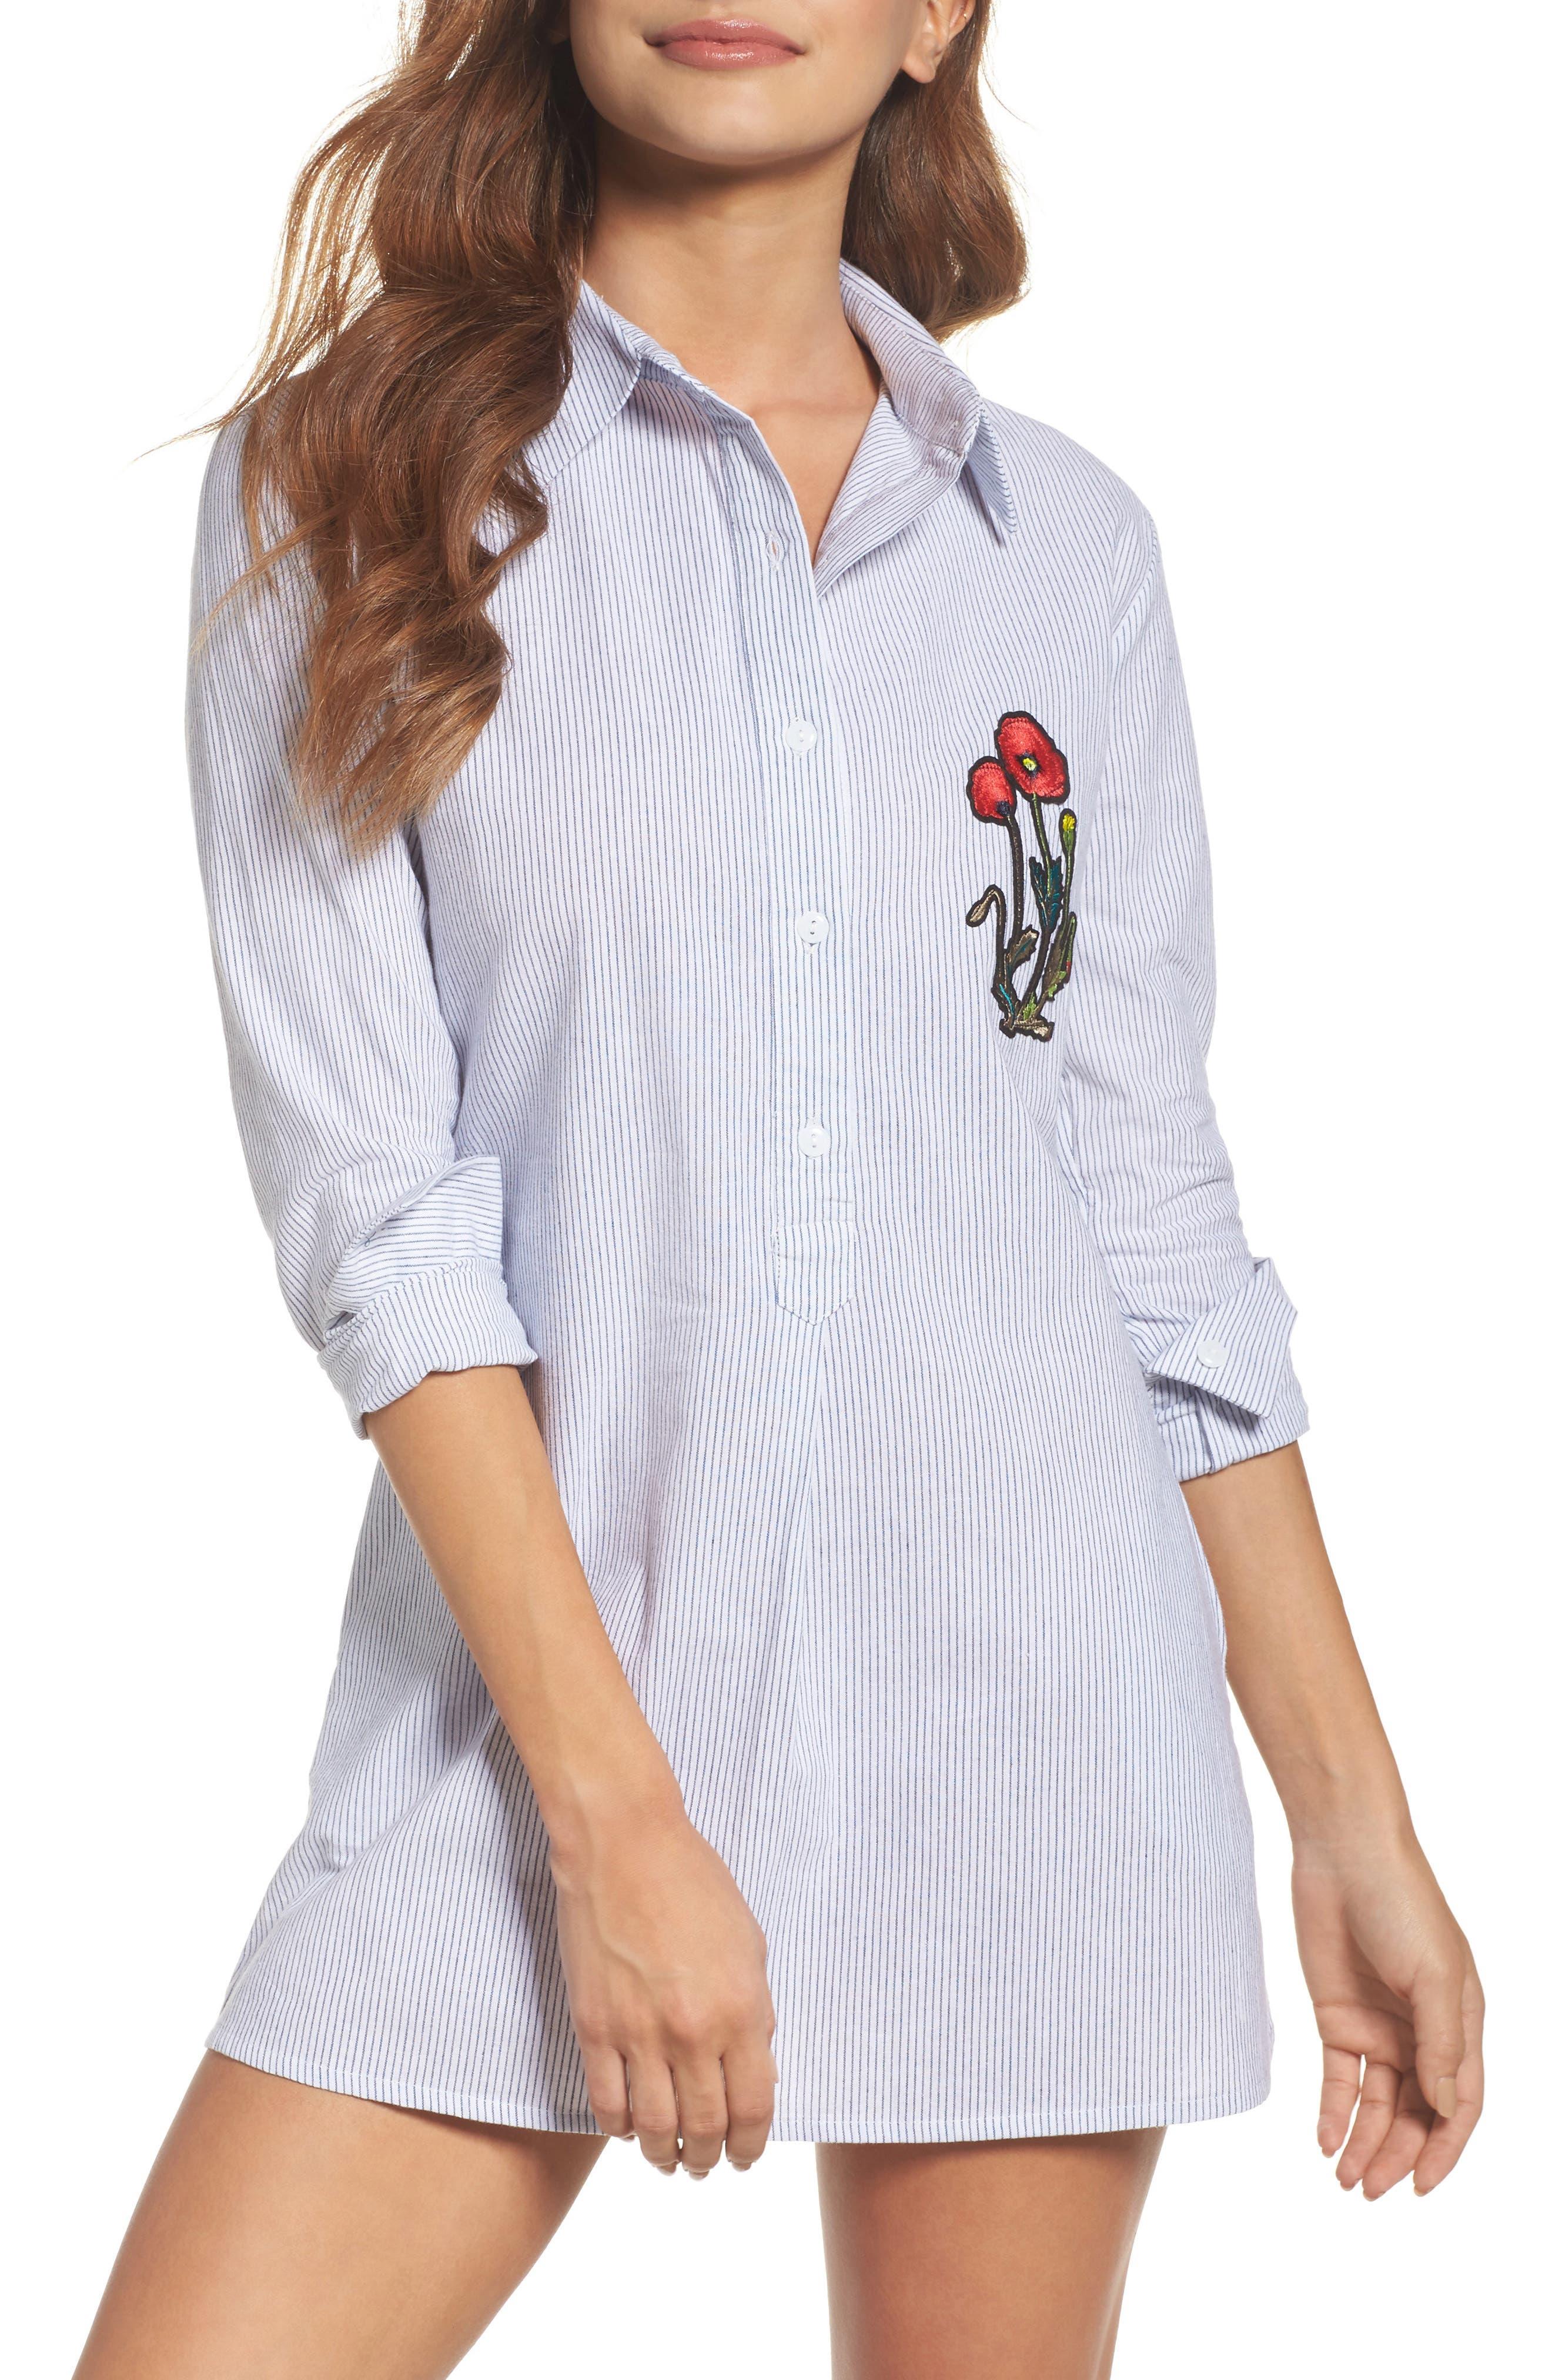 Sam Edelman Embroidered Sleep Shirt